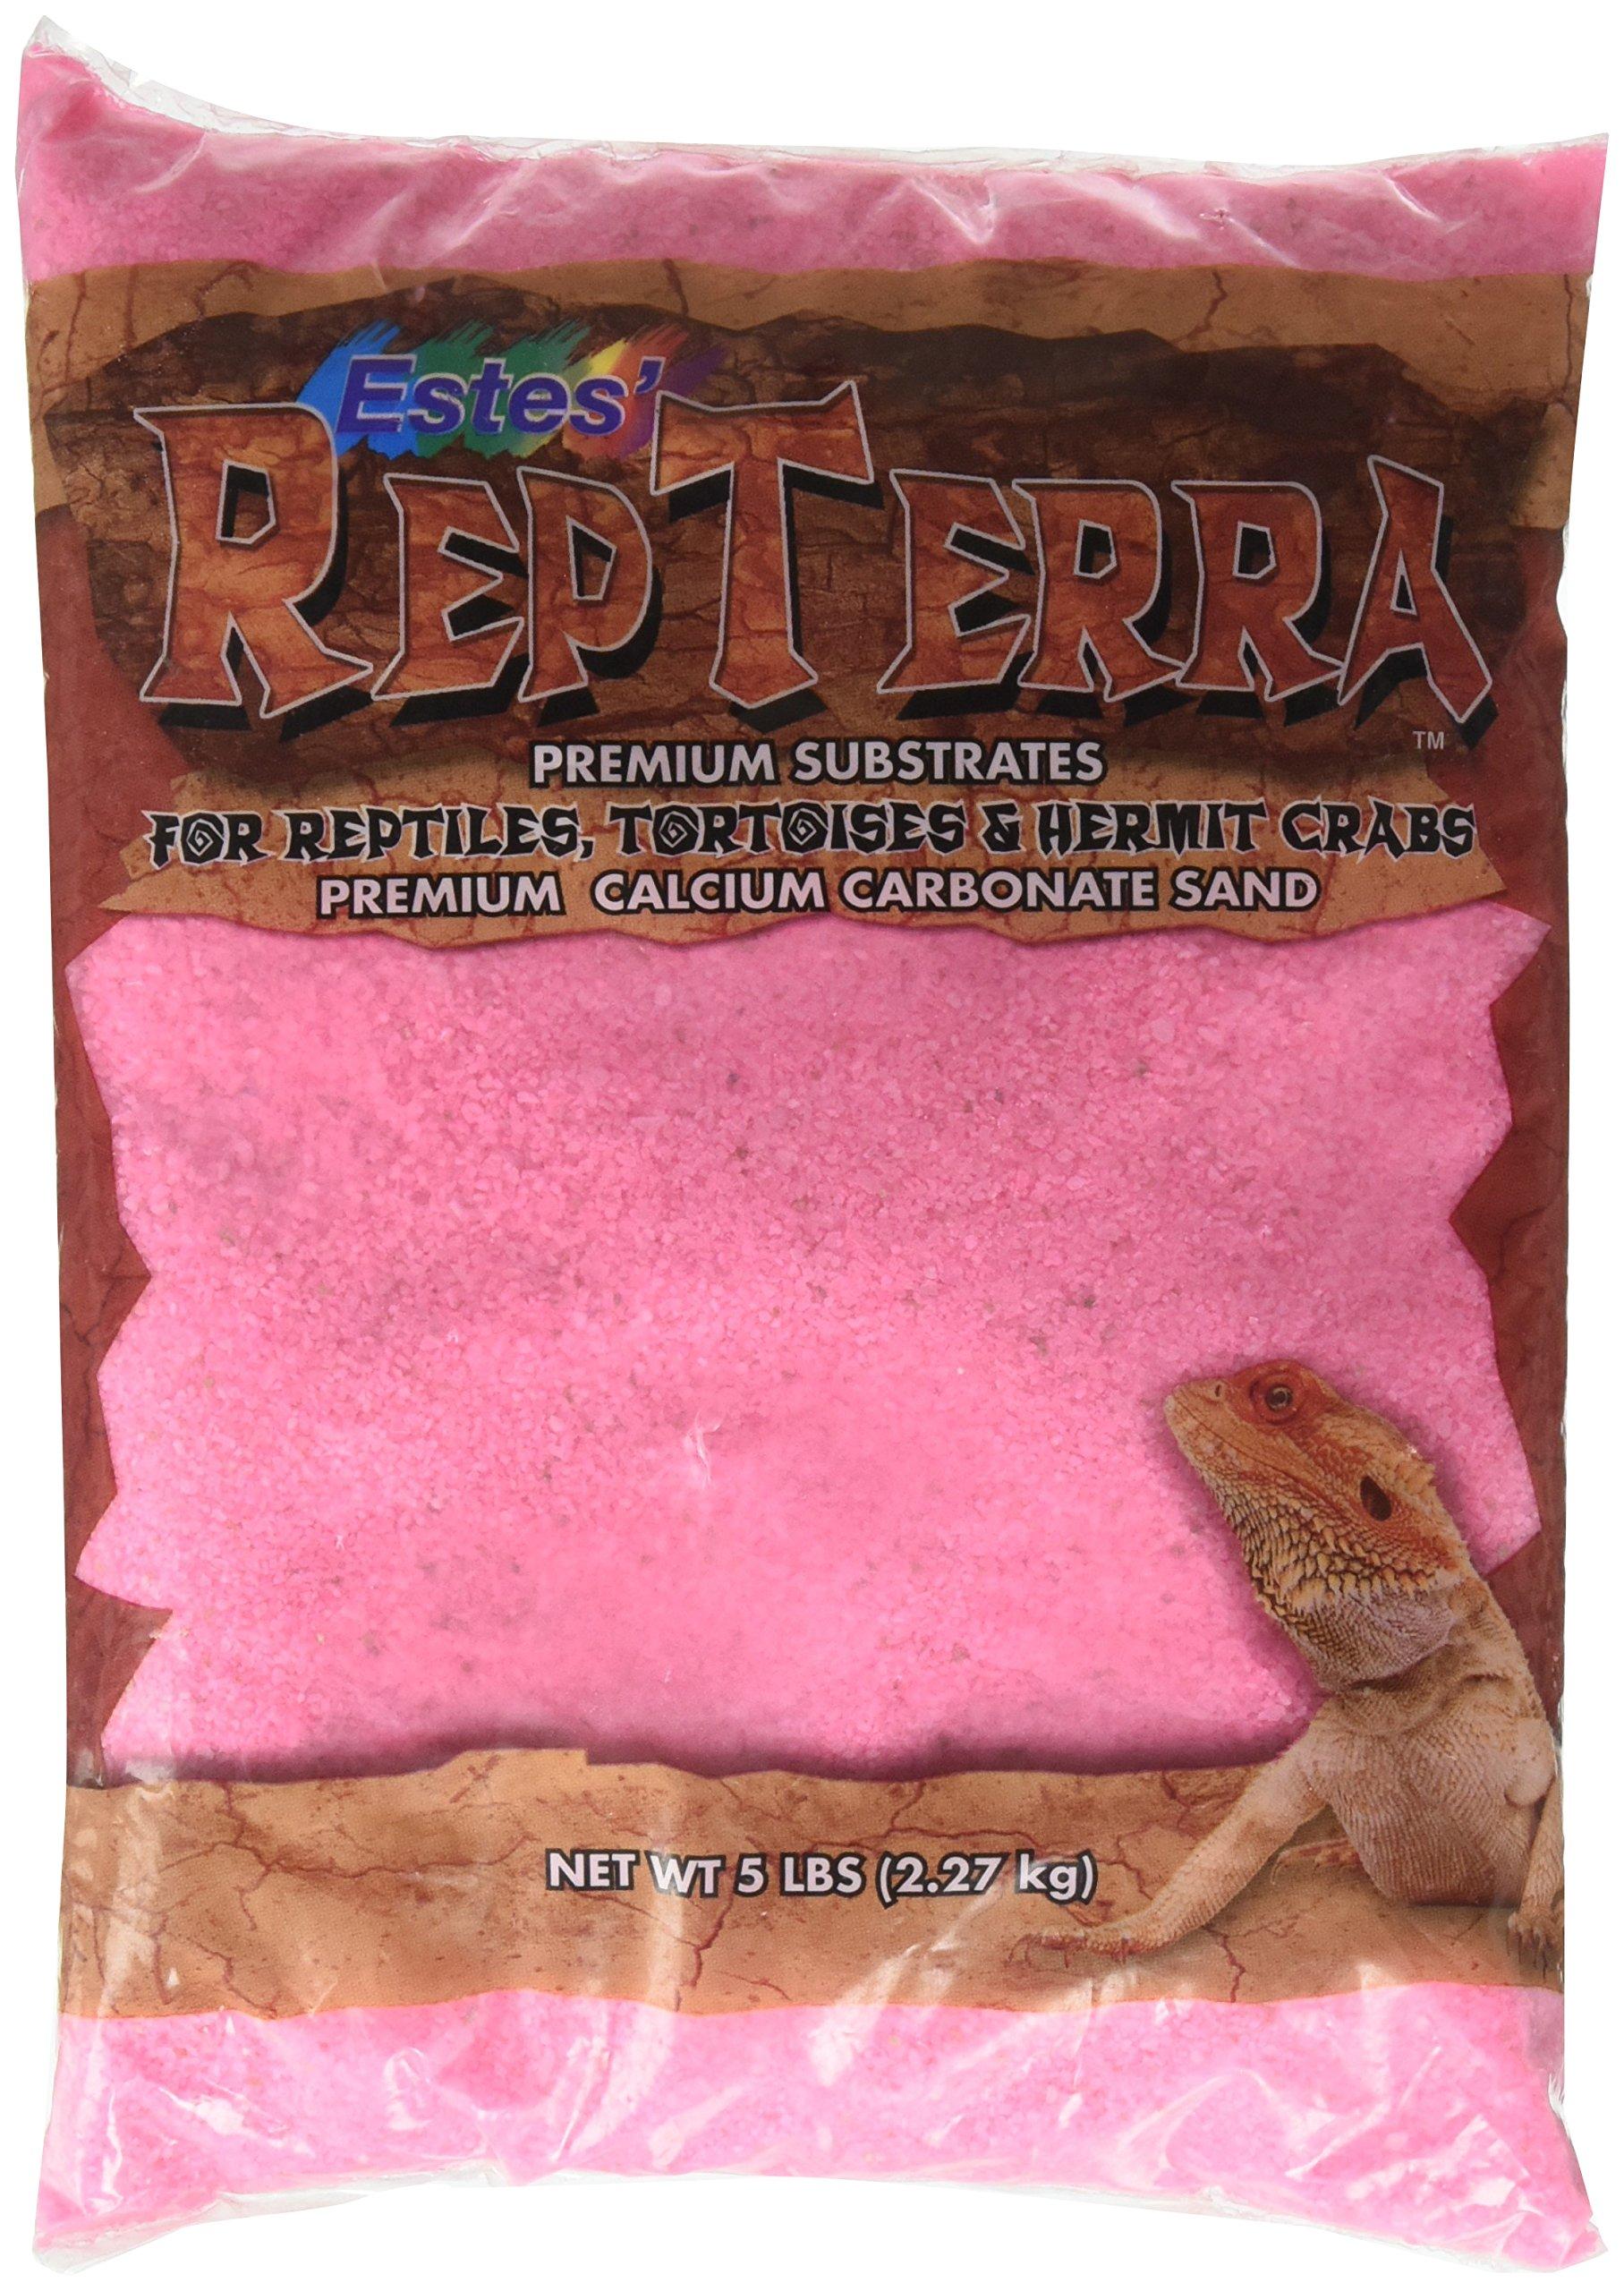 Estes Gravel Products SES62105 5-Pack RepTerra Reptile Calcium Carbonate Sand, 5-Pound, Pink by Estes'